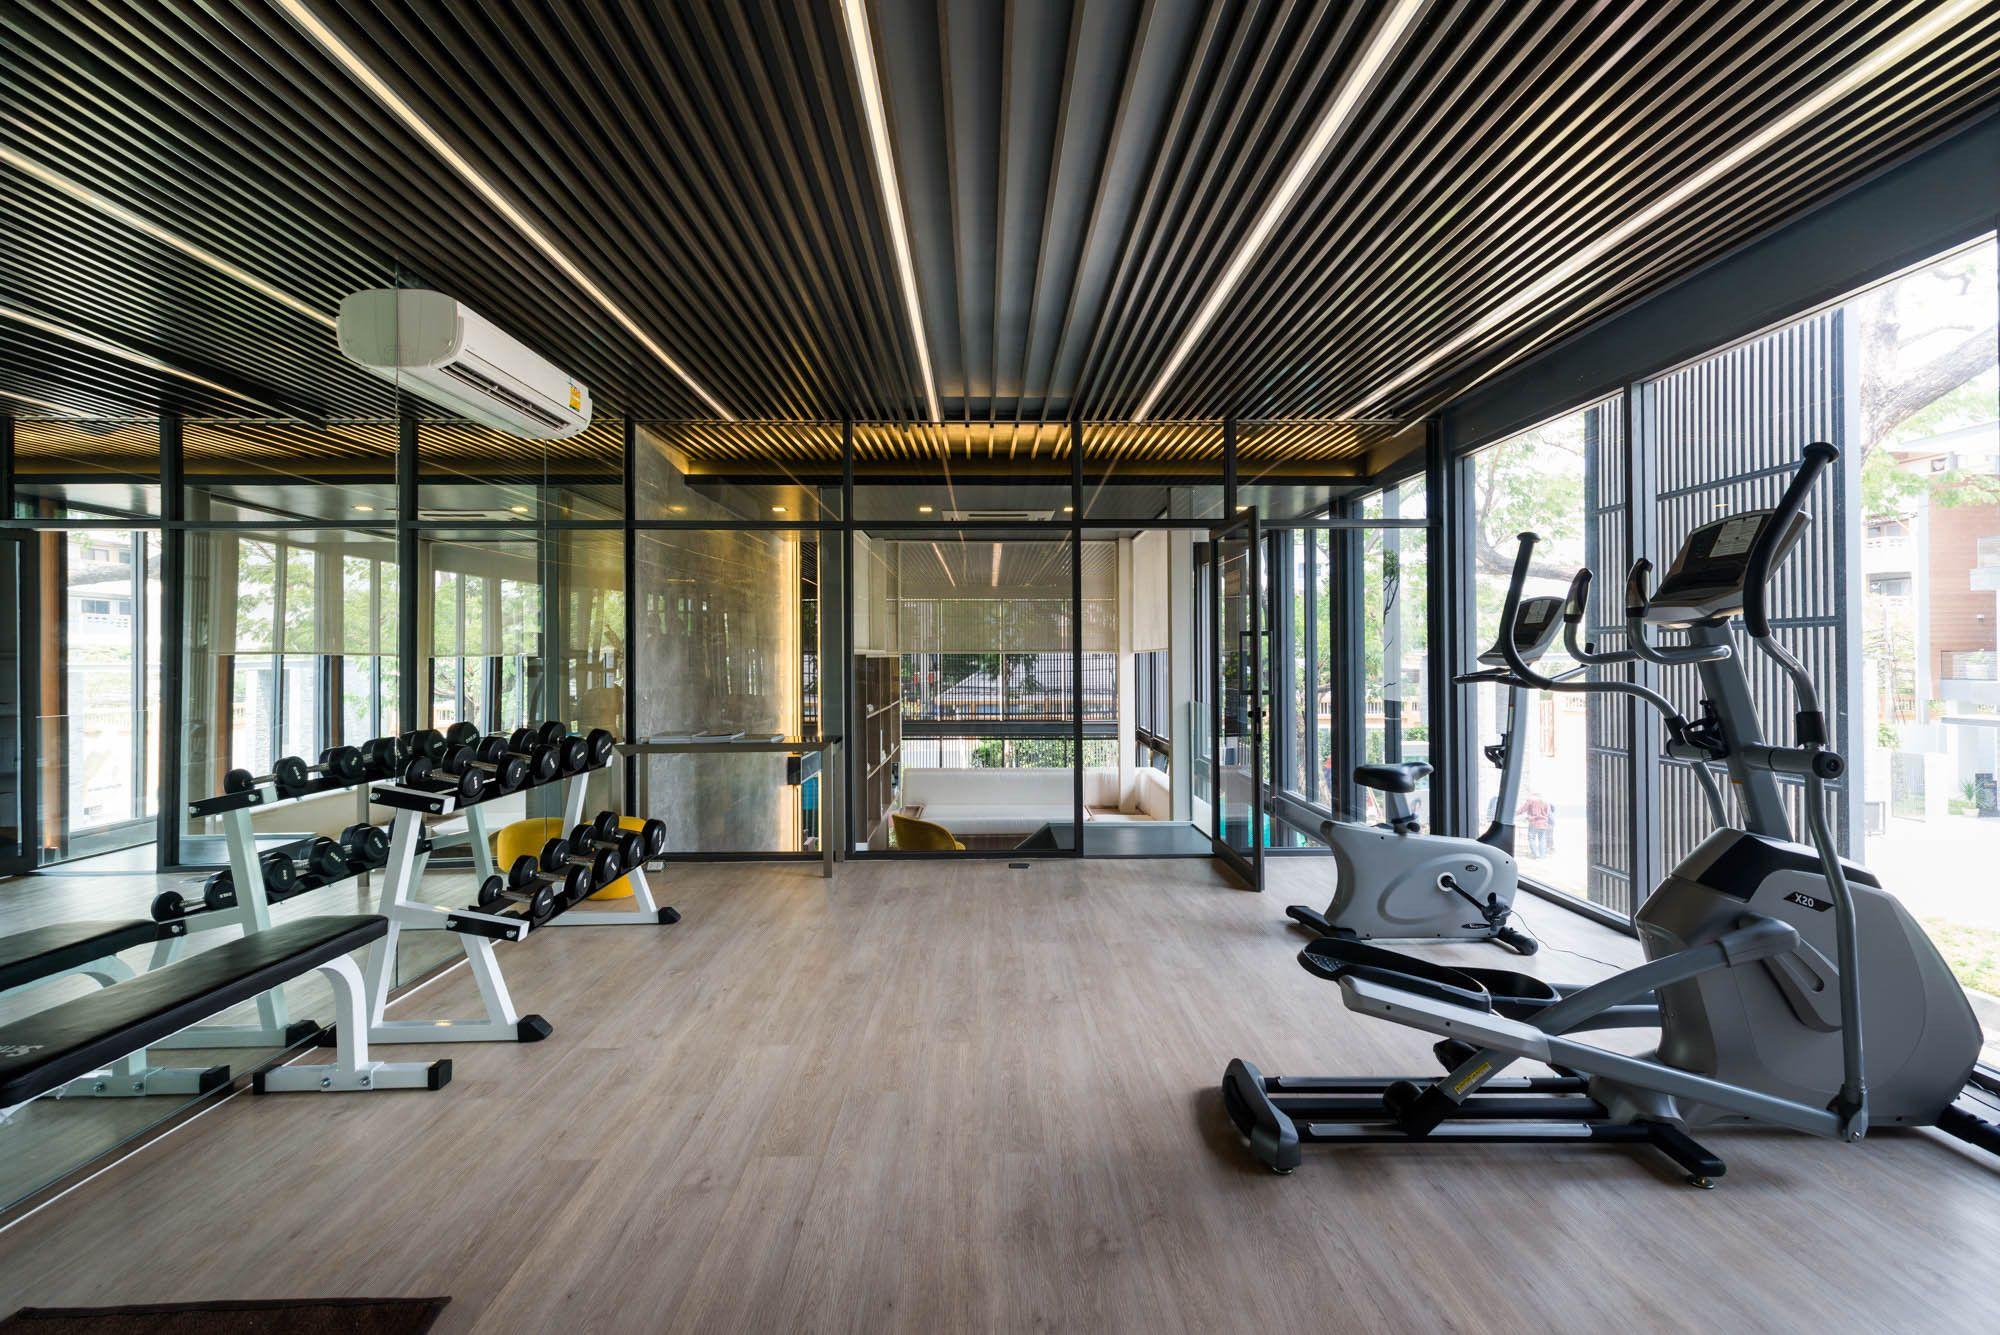 Gallery Of The Honor Clubhouse Podesign 5 Home Gym Design Gym Design Gym Interior